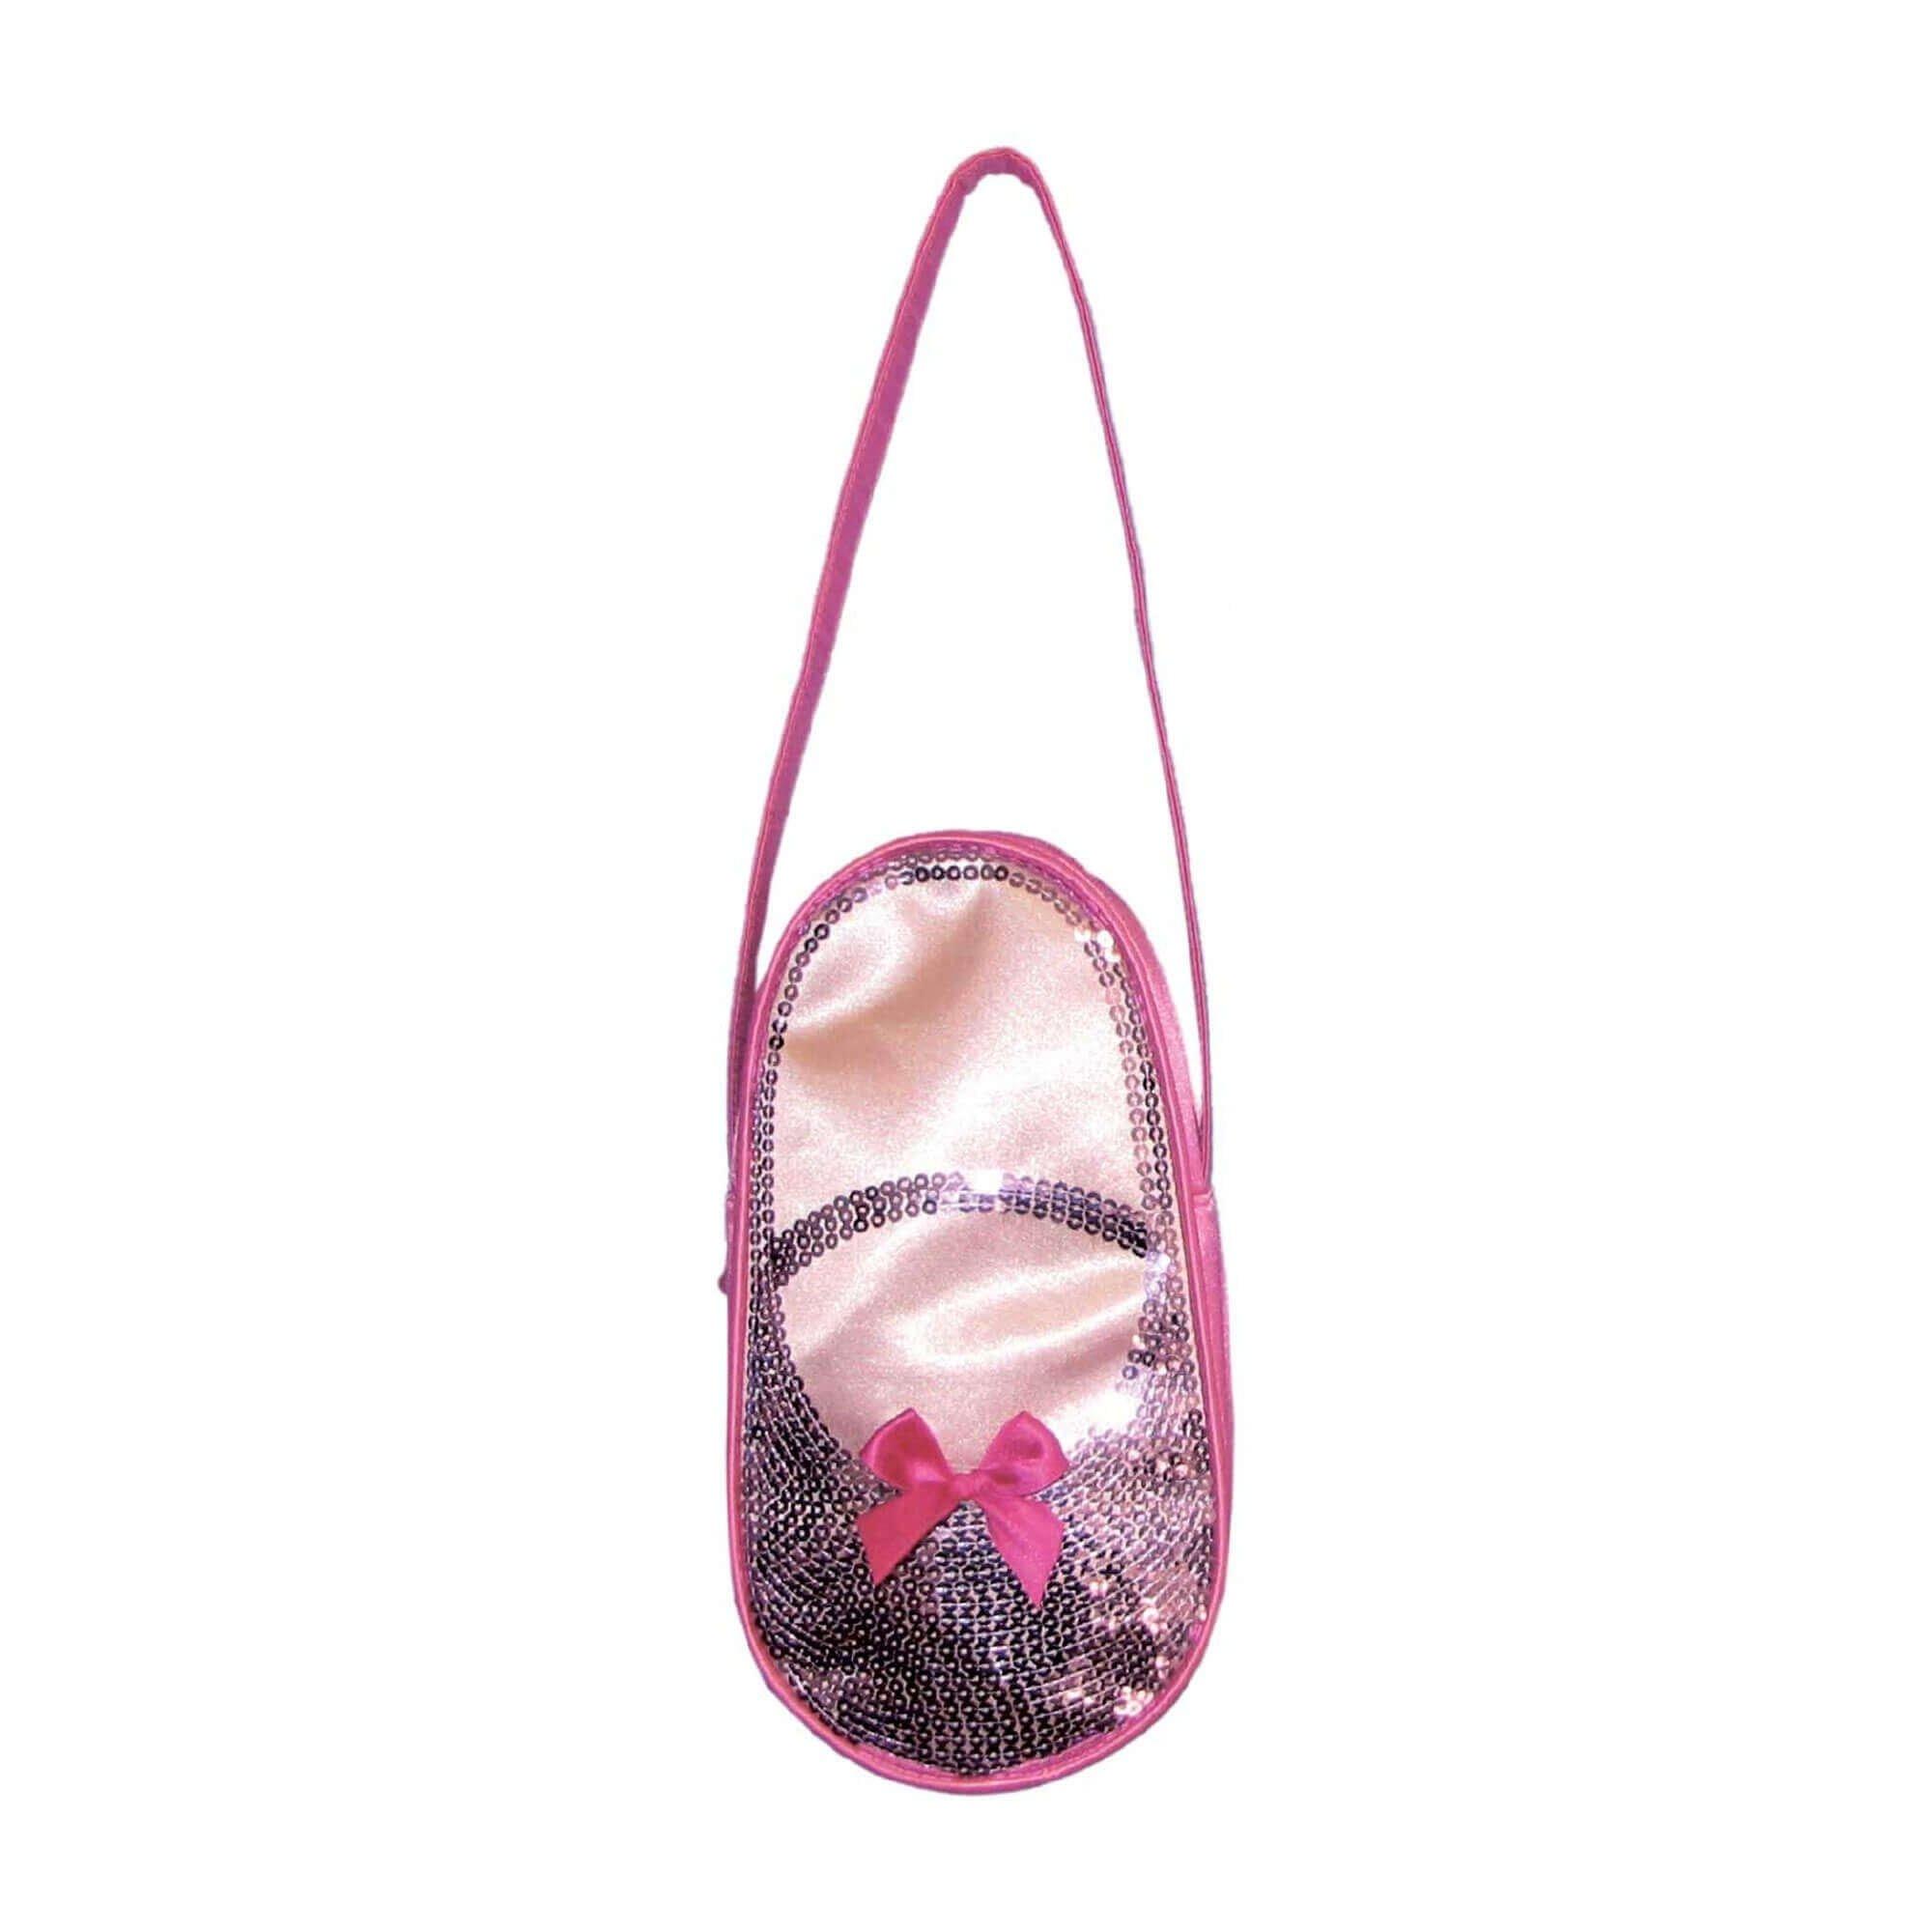 Horizon Dance Satin & Sequins Ballet Shoes Slipper Bag